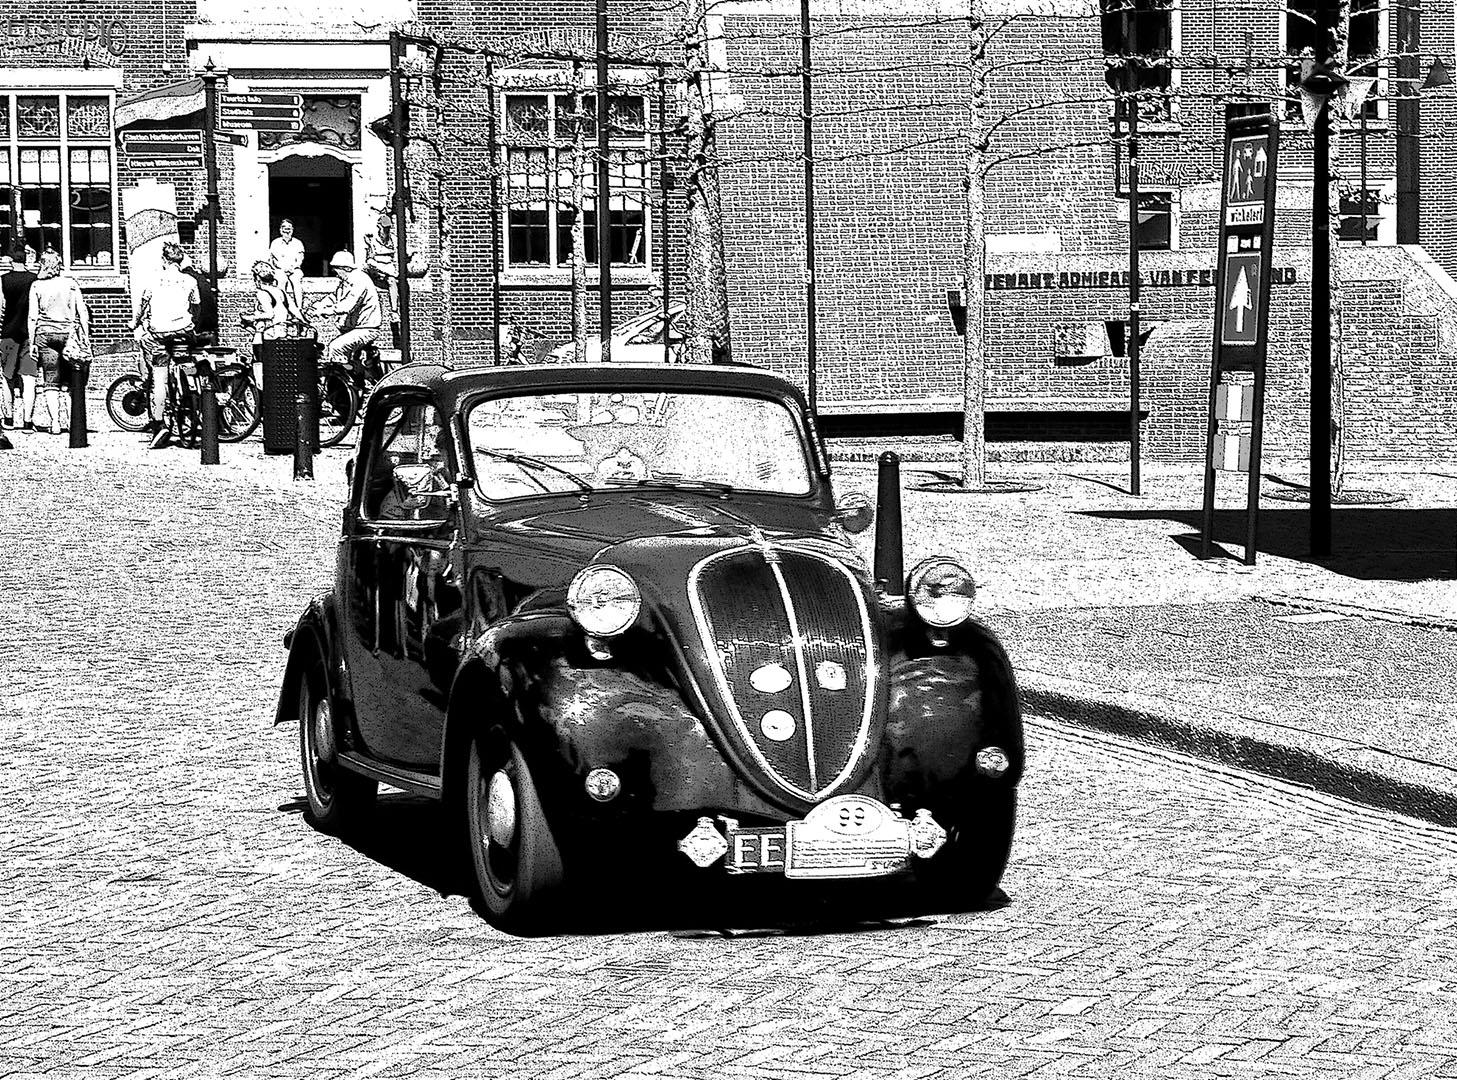 Automobiles_064_H16.2.49